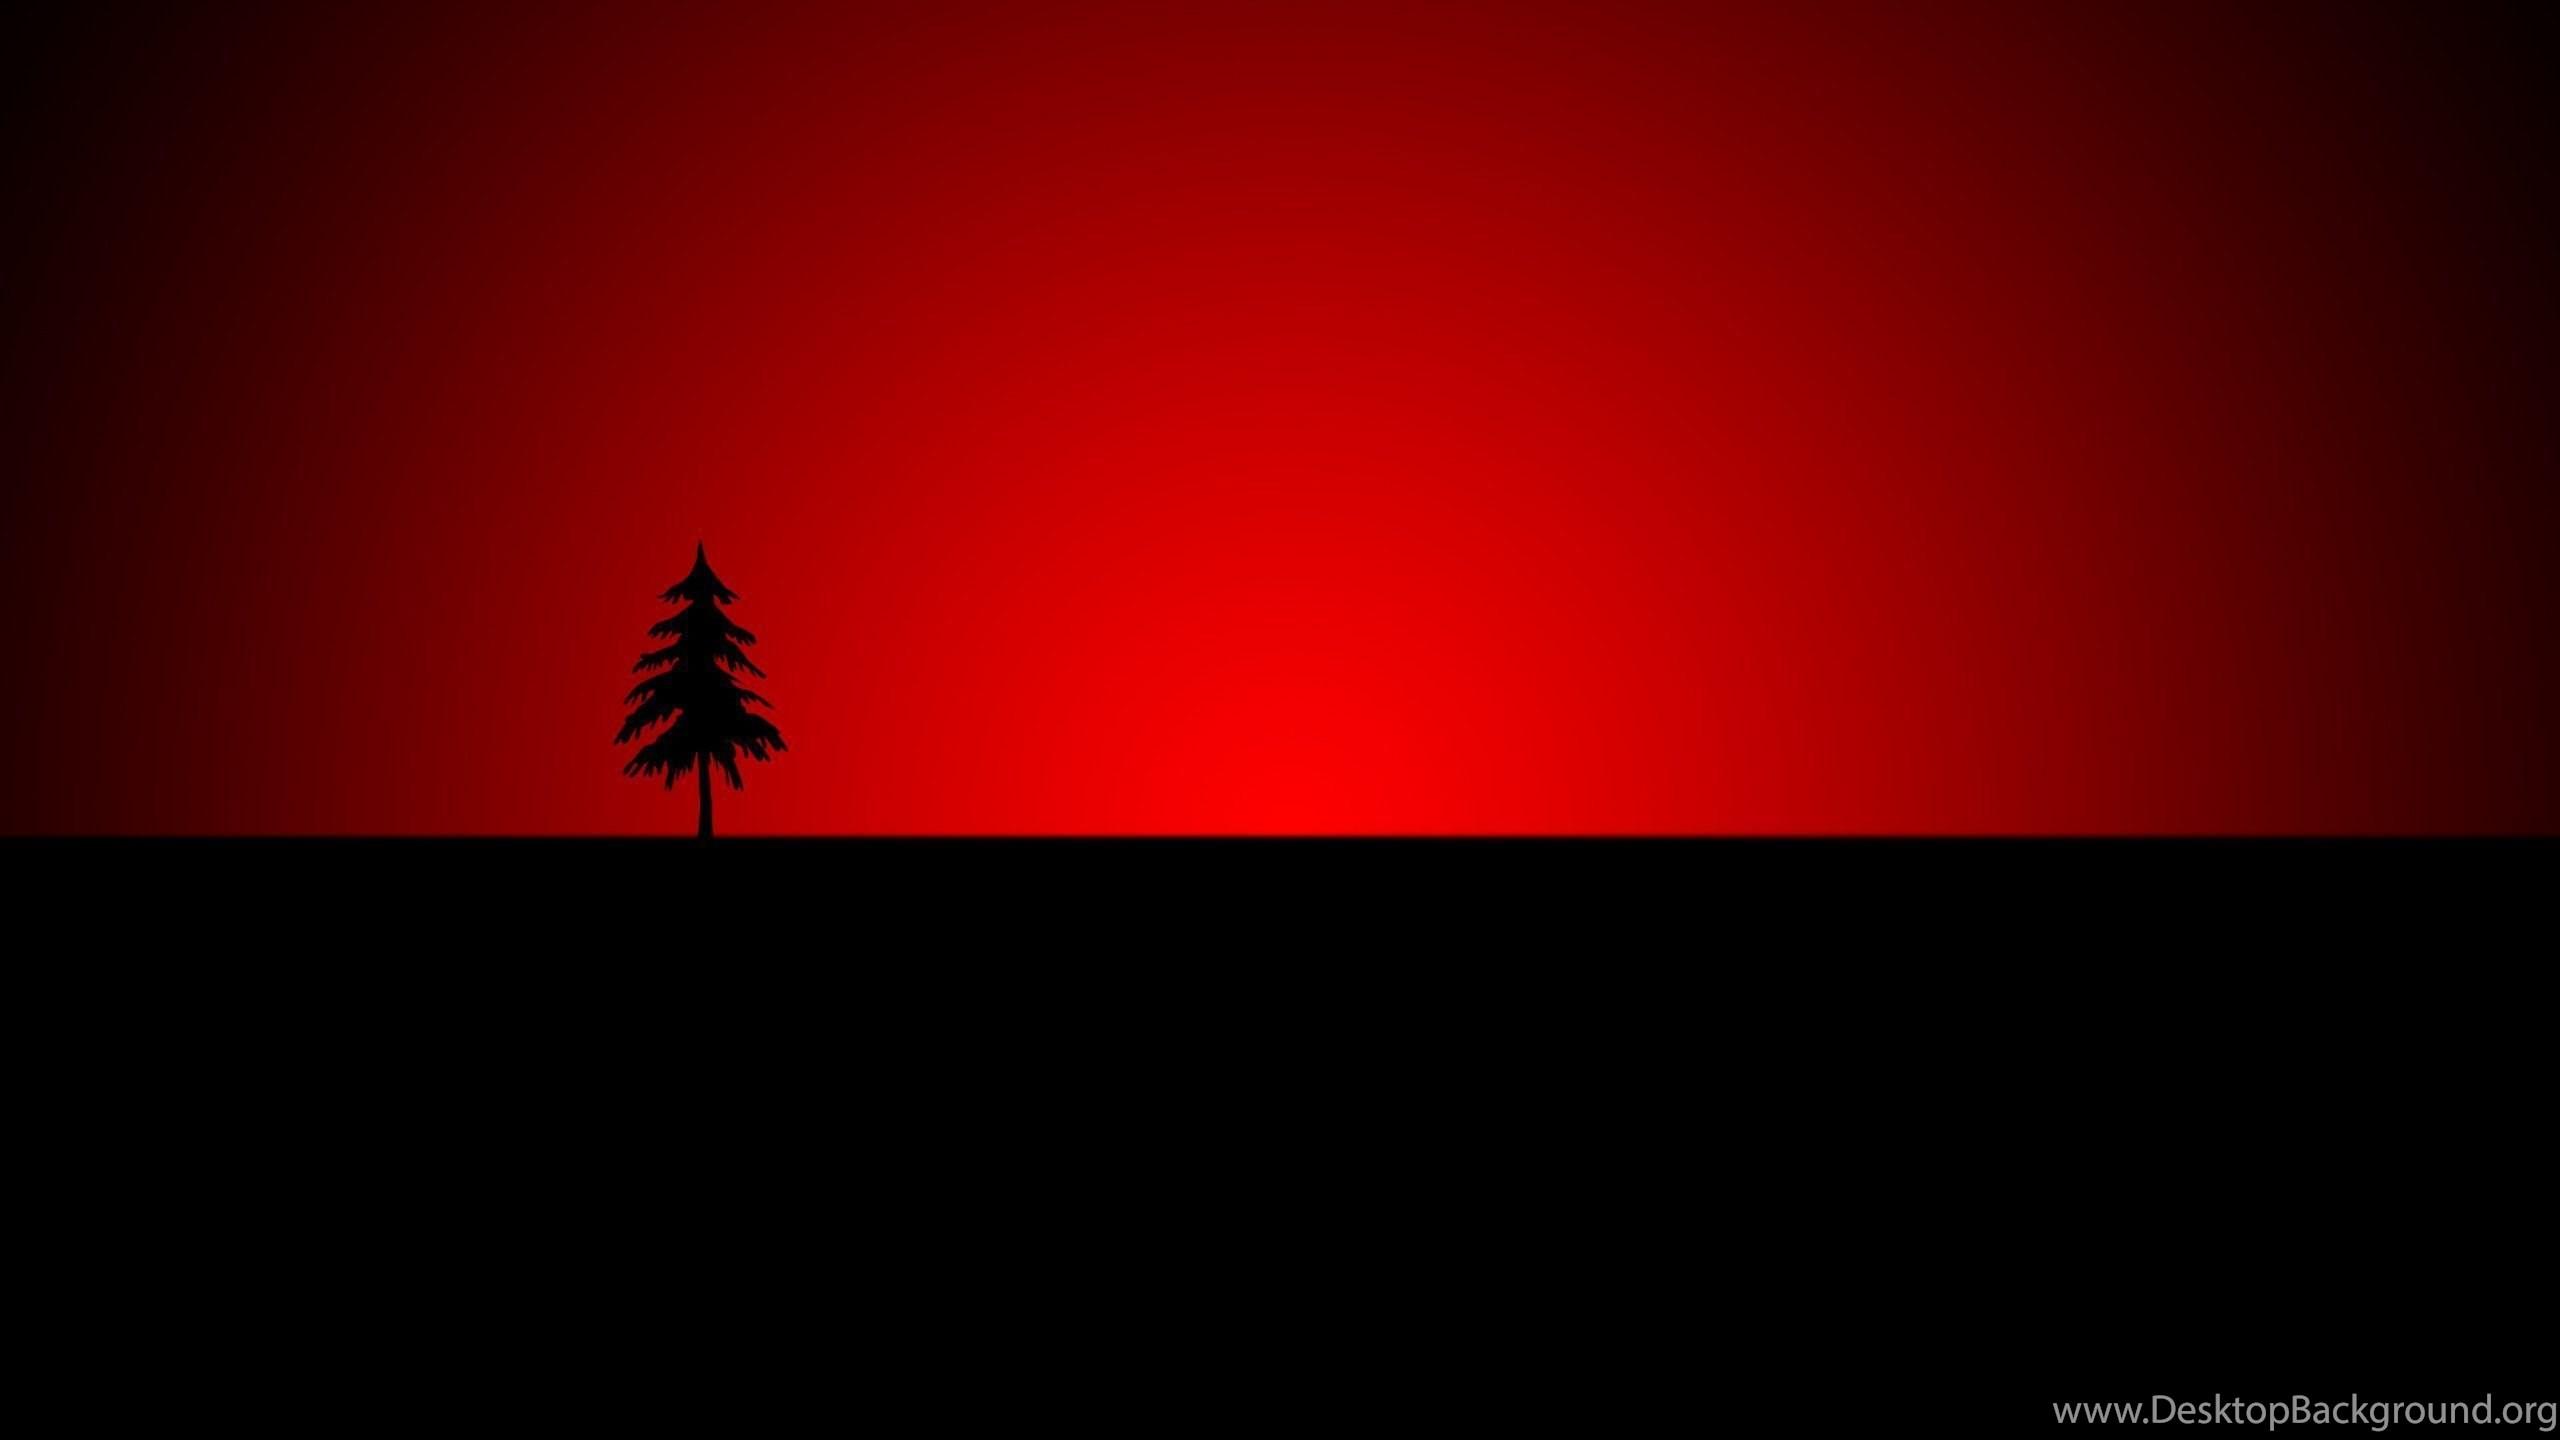 Cool Red Desktop Backgrounds